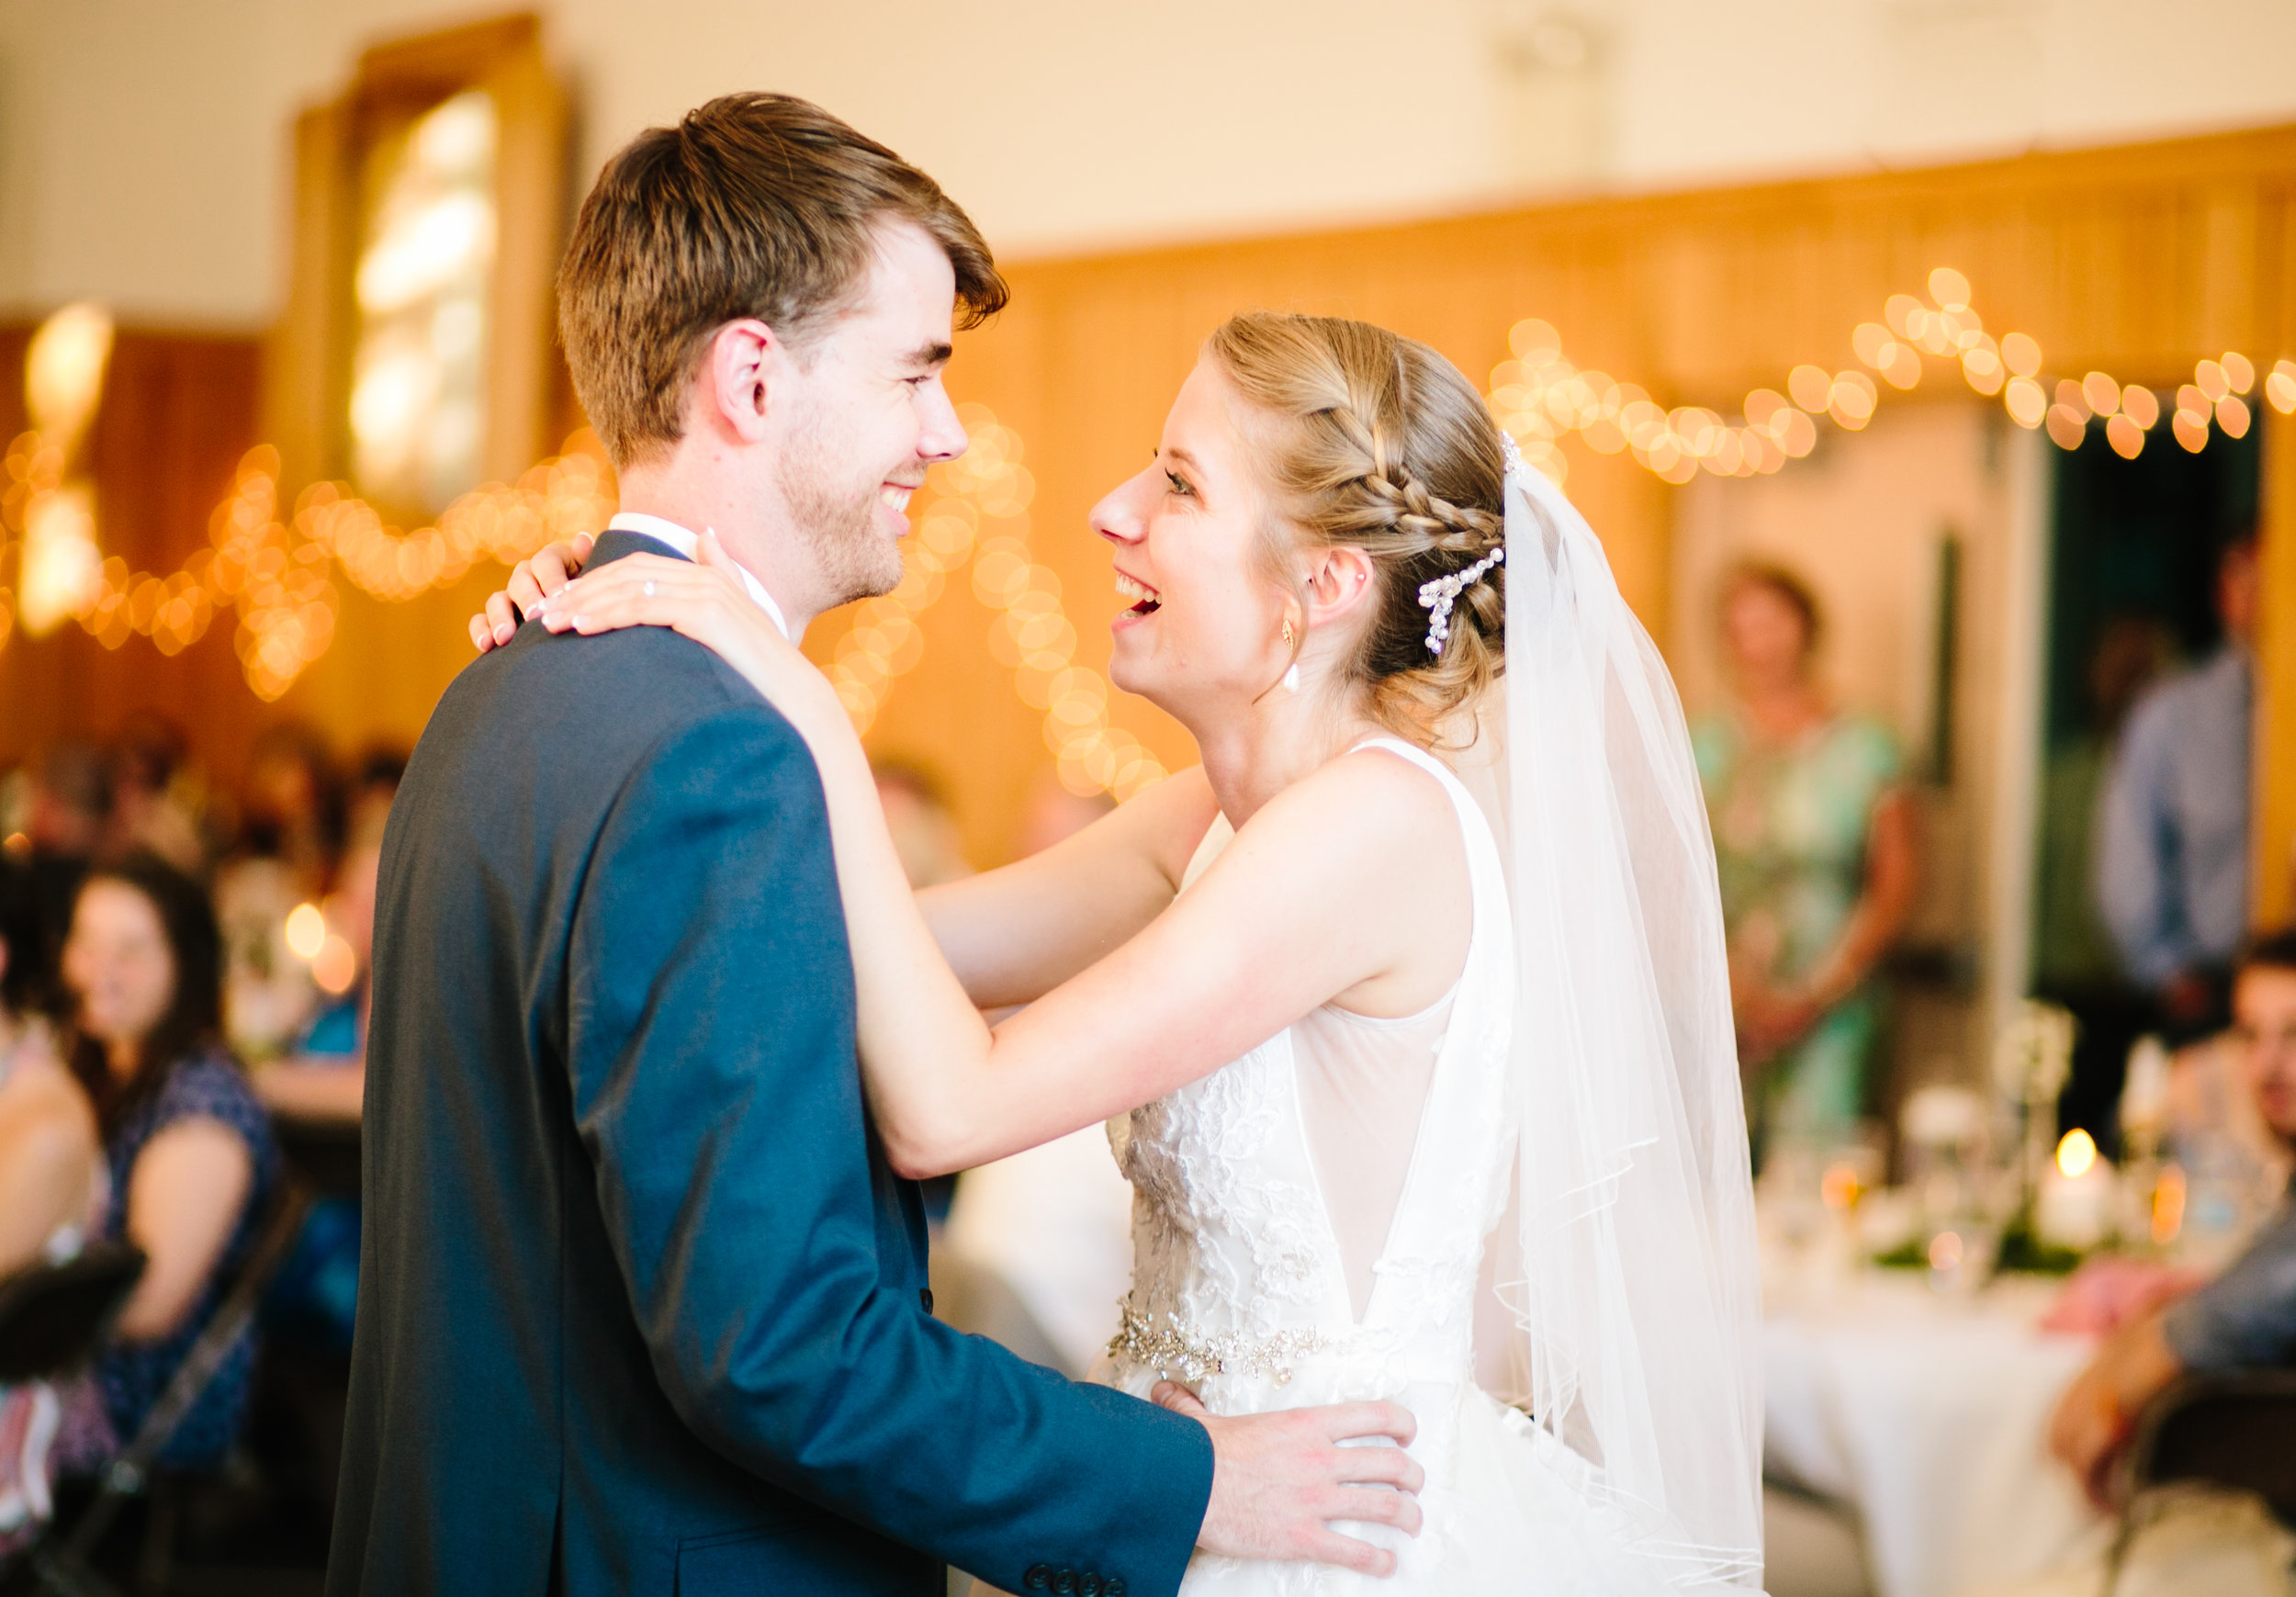 carleyauston_firstdance_elverson_pa_summer_wedding_image-11.jpg